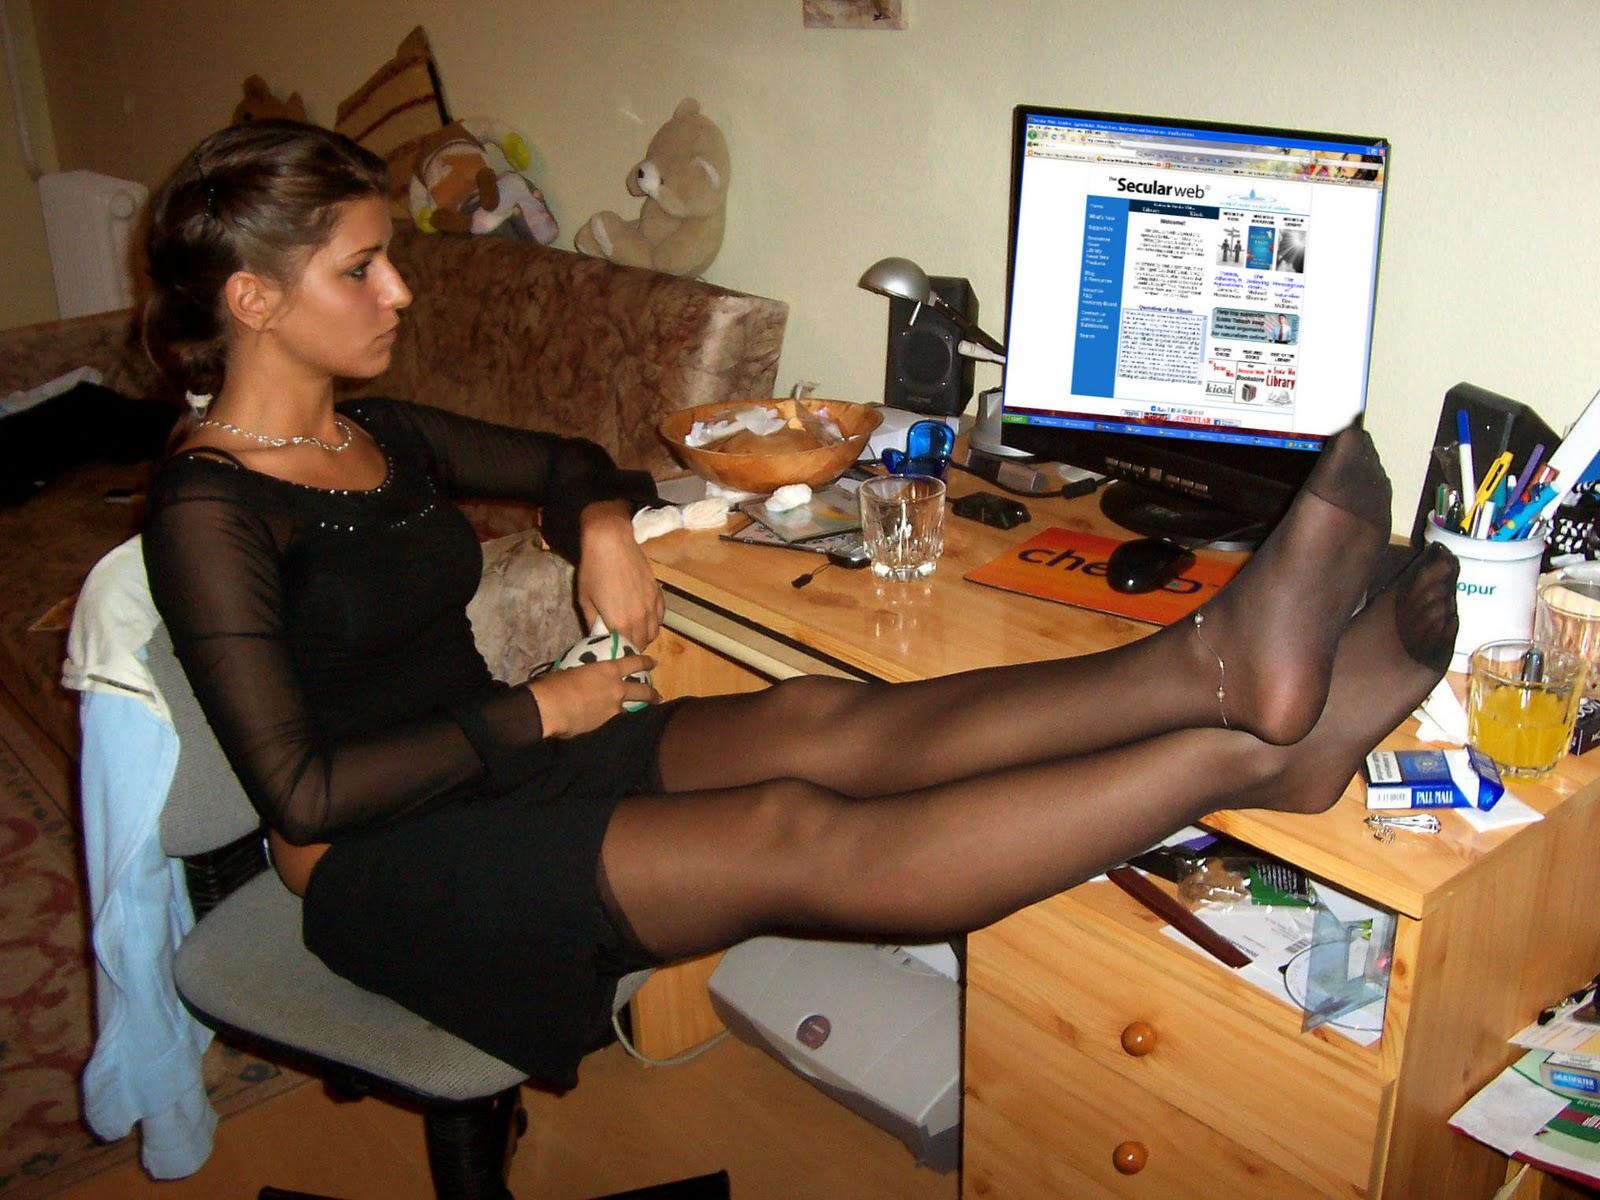 Фото секс русское домашнее, Домашнее порно фото - частное секс фото 3 фотография